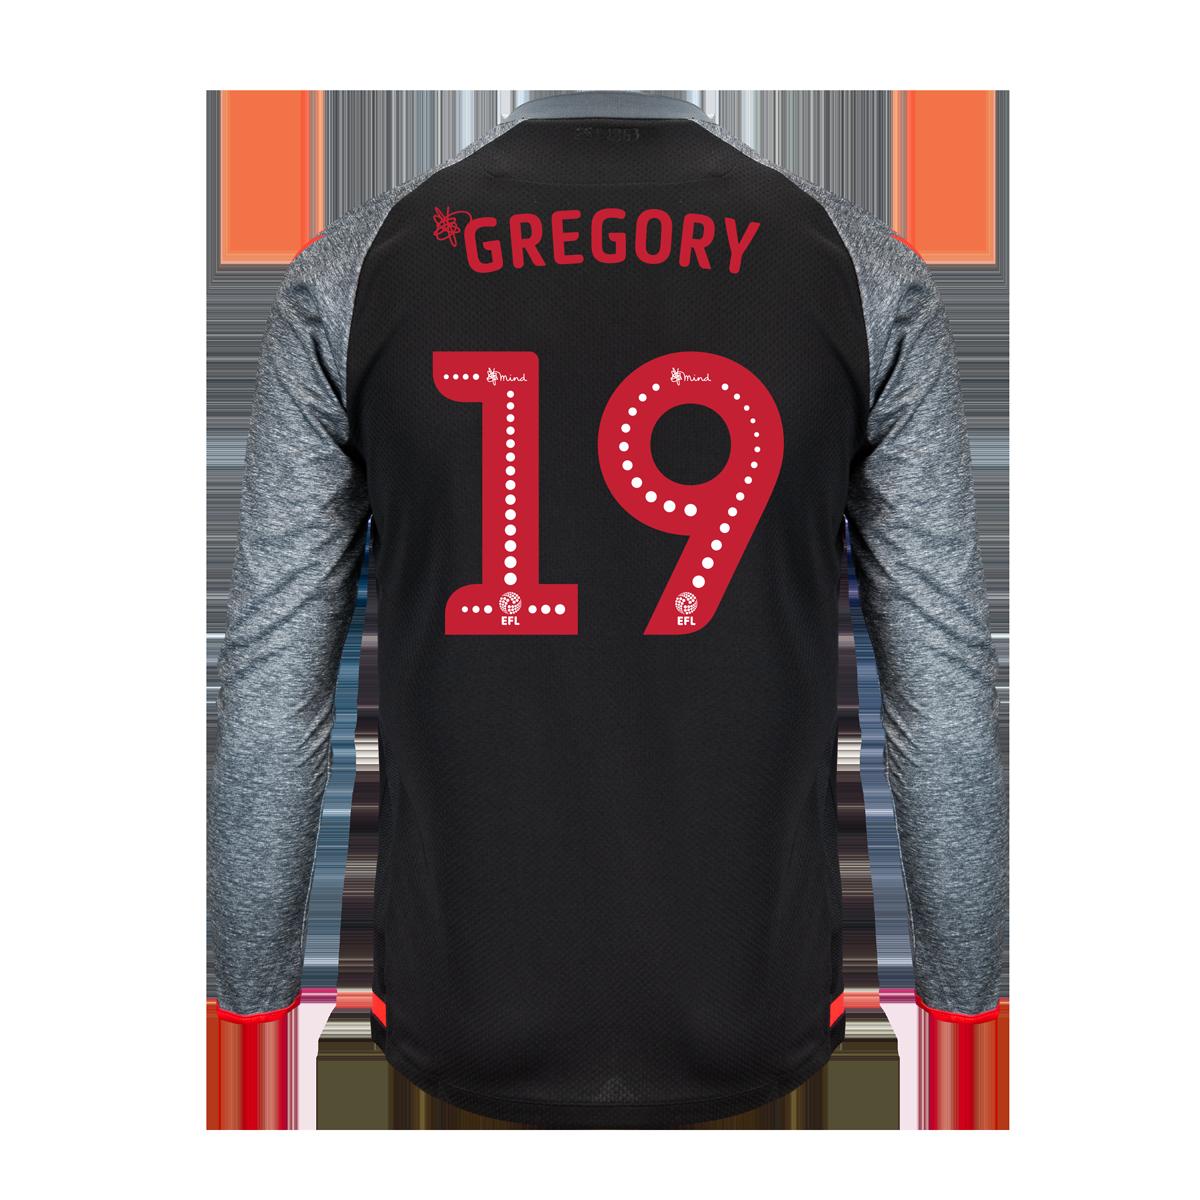 2019/20 Adult Away LS Shirt - Gregory